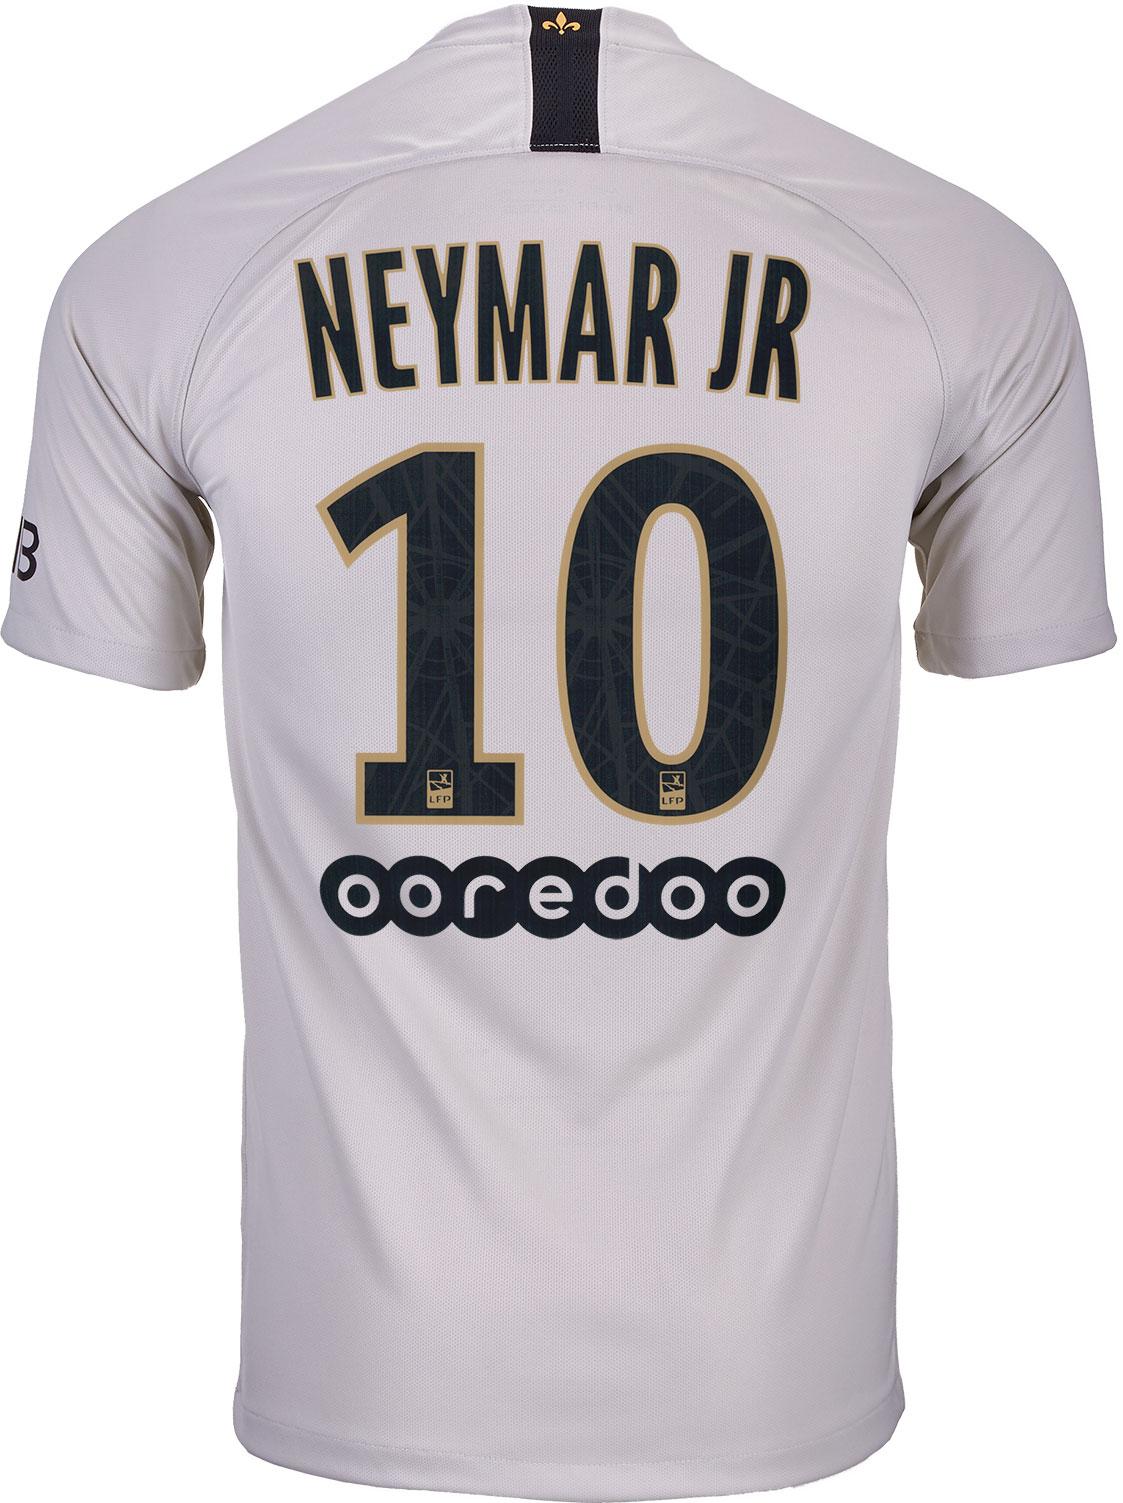 a153c97e9f7 Nike Neymar Jr. PSG Away Jersey - Youth 2018-19 - Cleatsxp